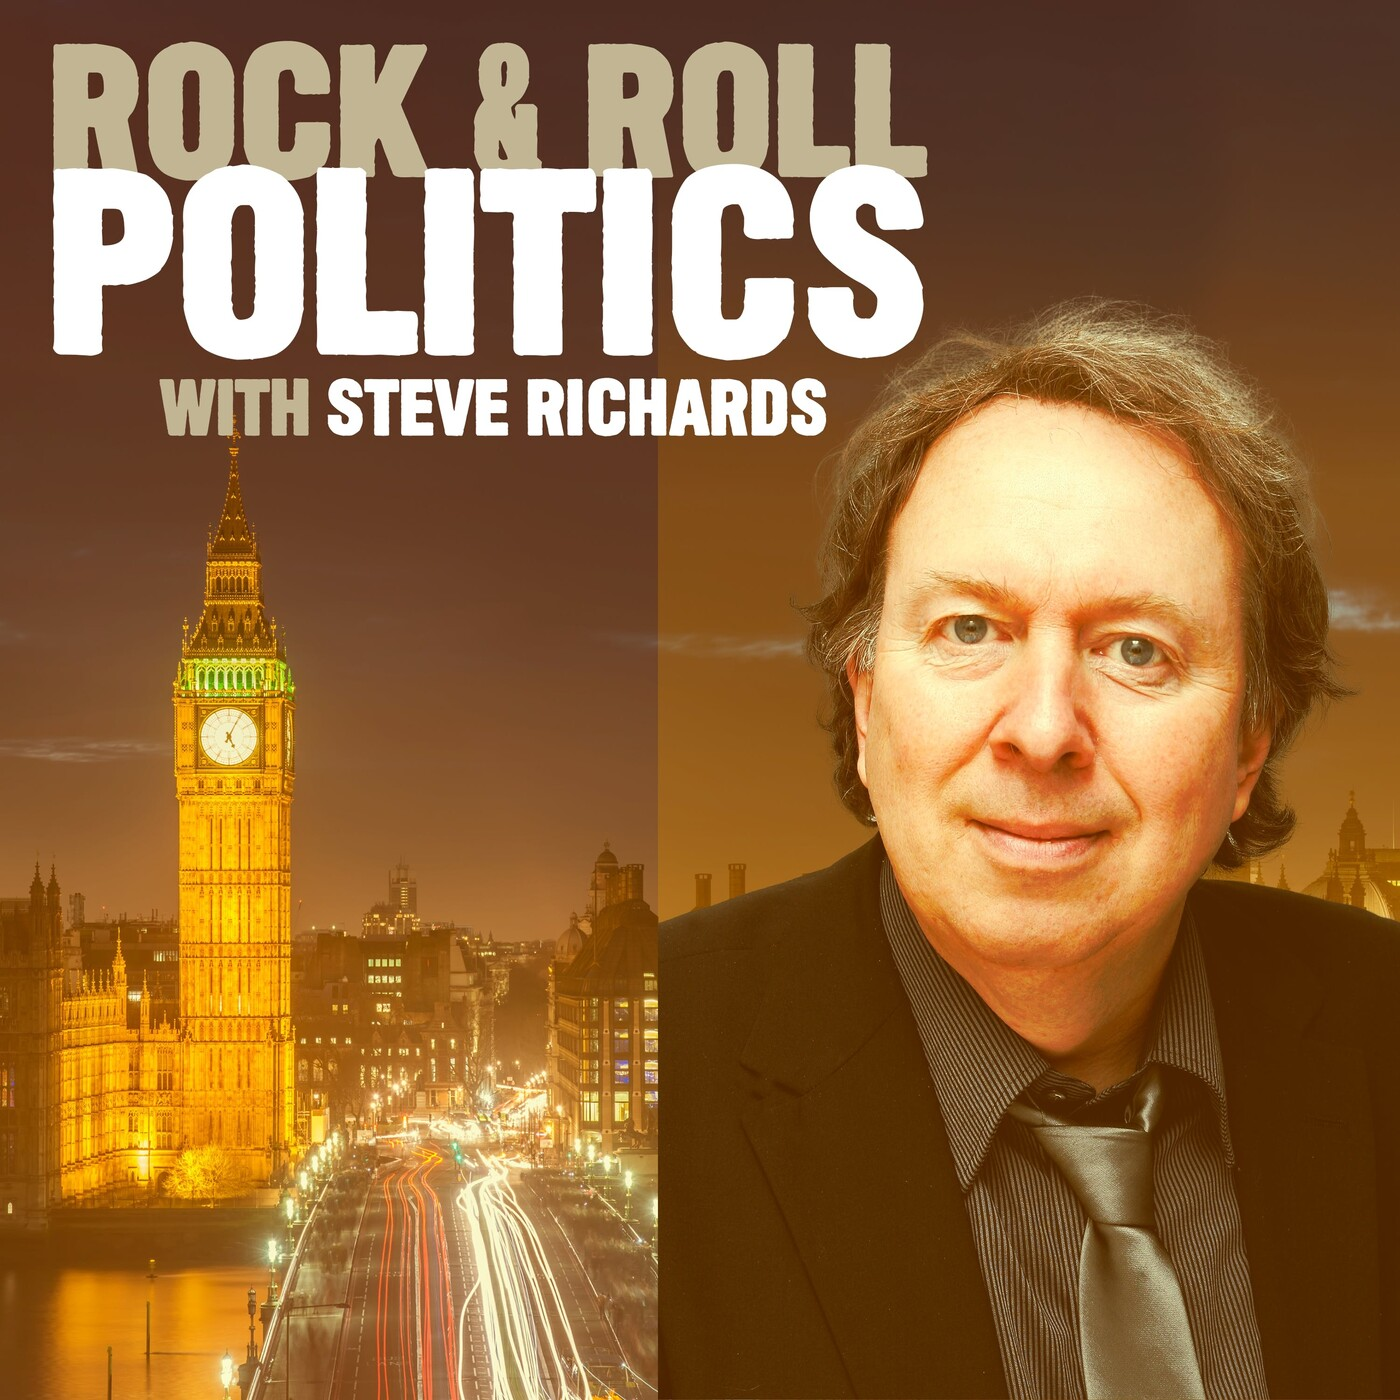 Steve Richards presents the Rock N Roll Politics p